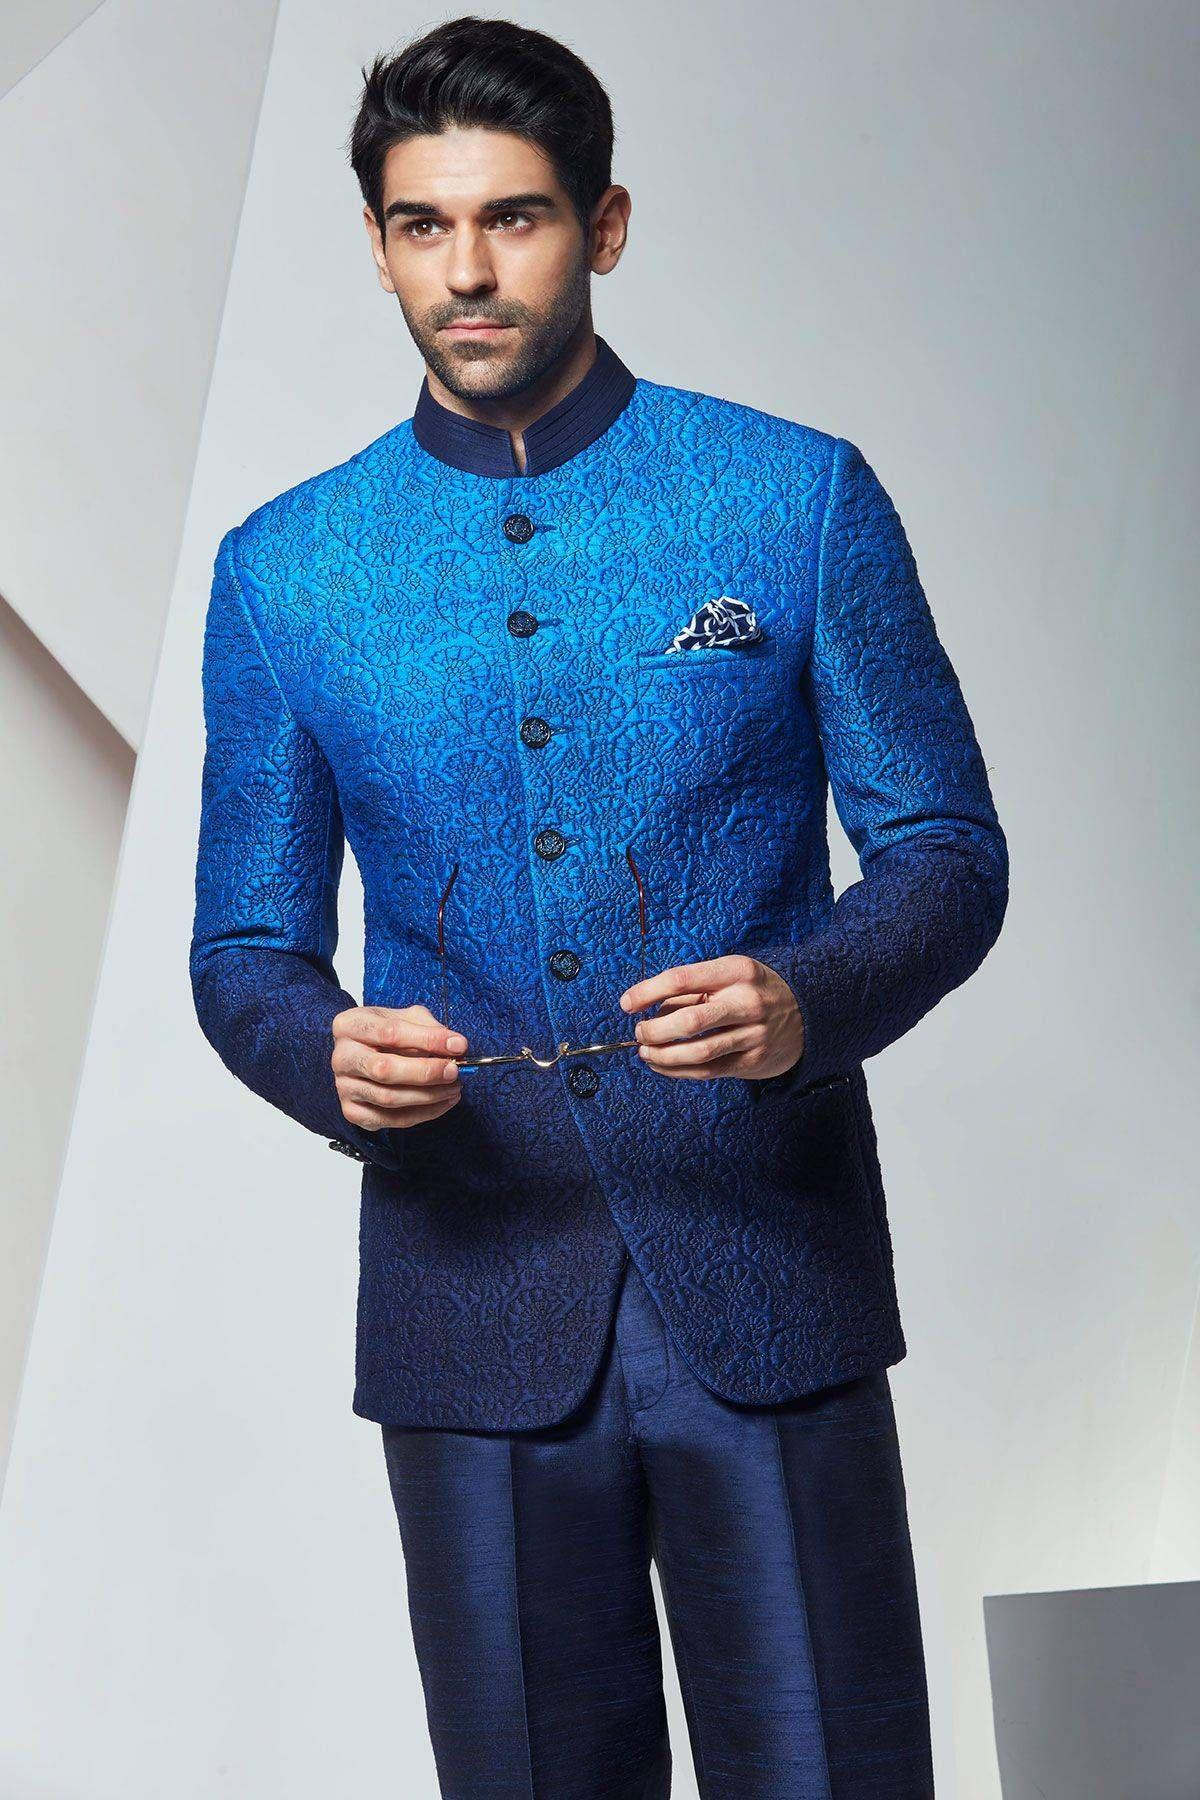 Designer jodhpuri suit,Jodhpuri suit for wedding,mens